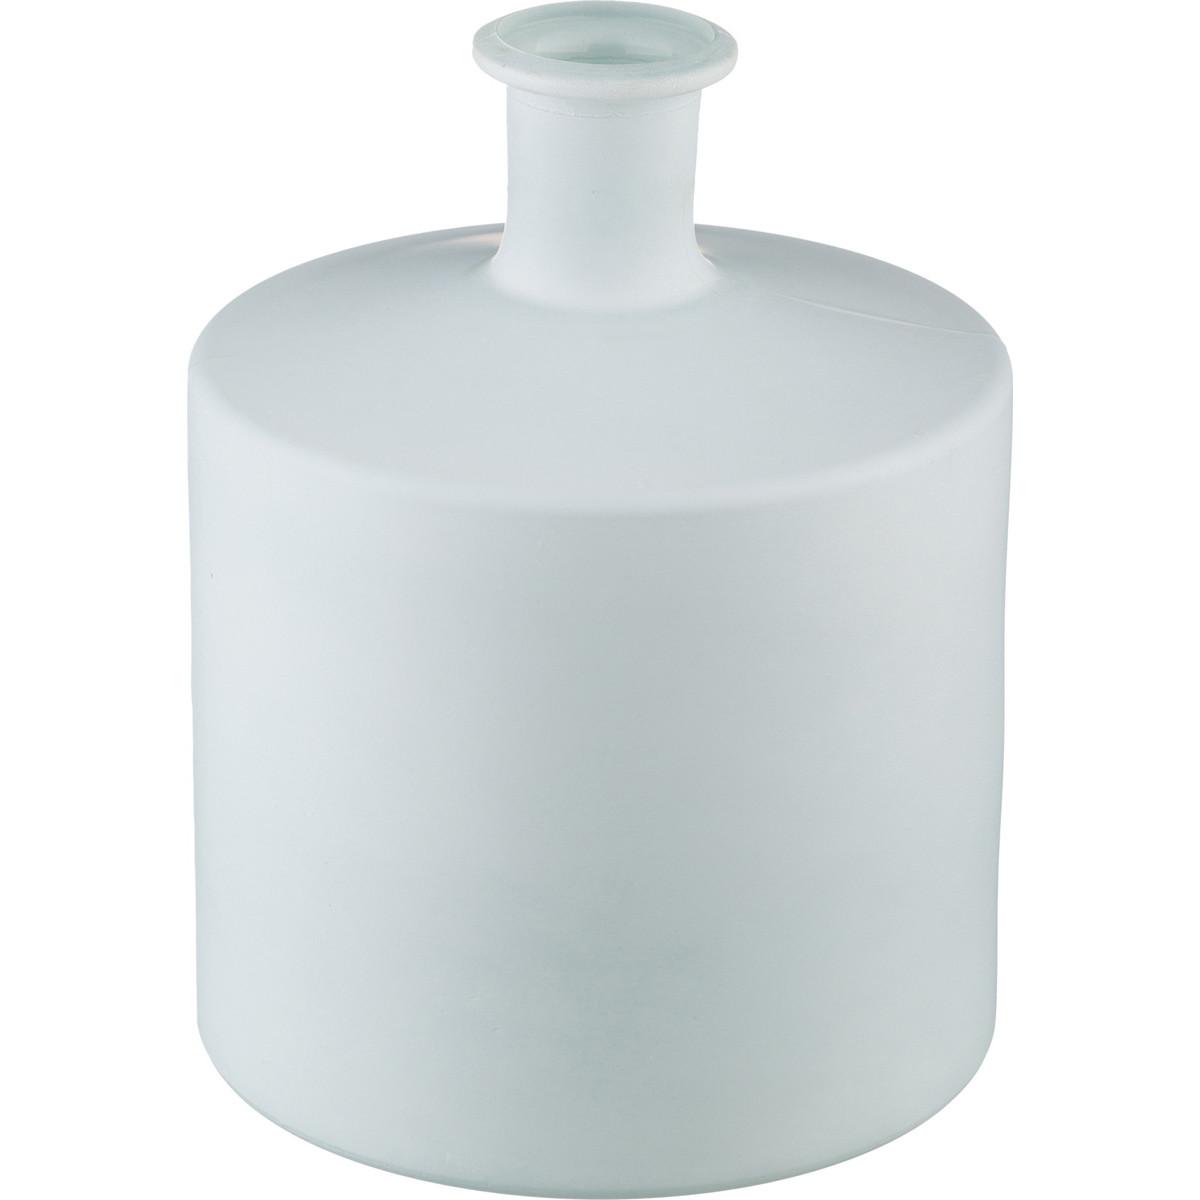 {} San Miguel Ваза Tori  (26 см) san miguel ваза hortense 16 см